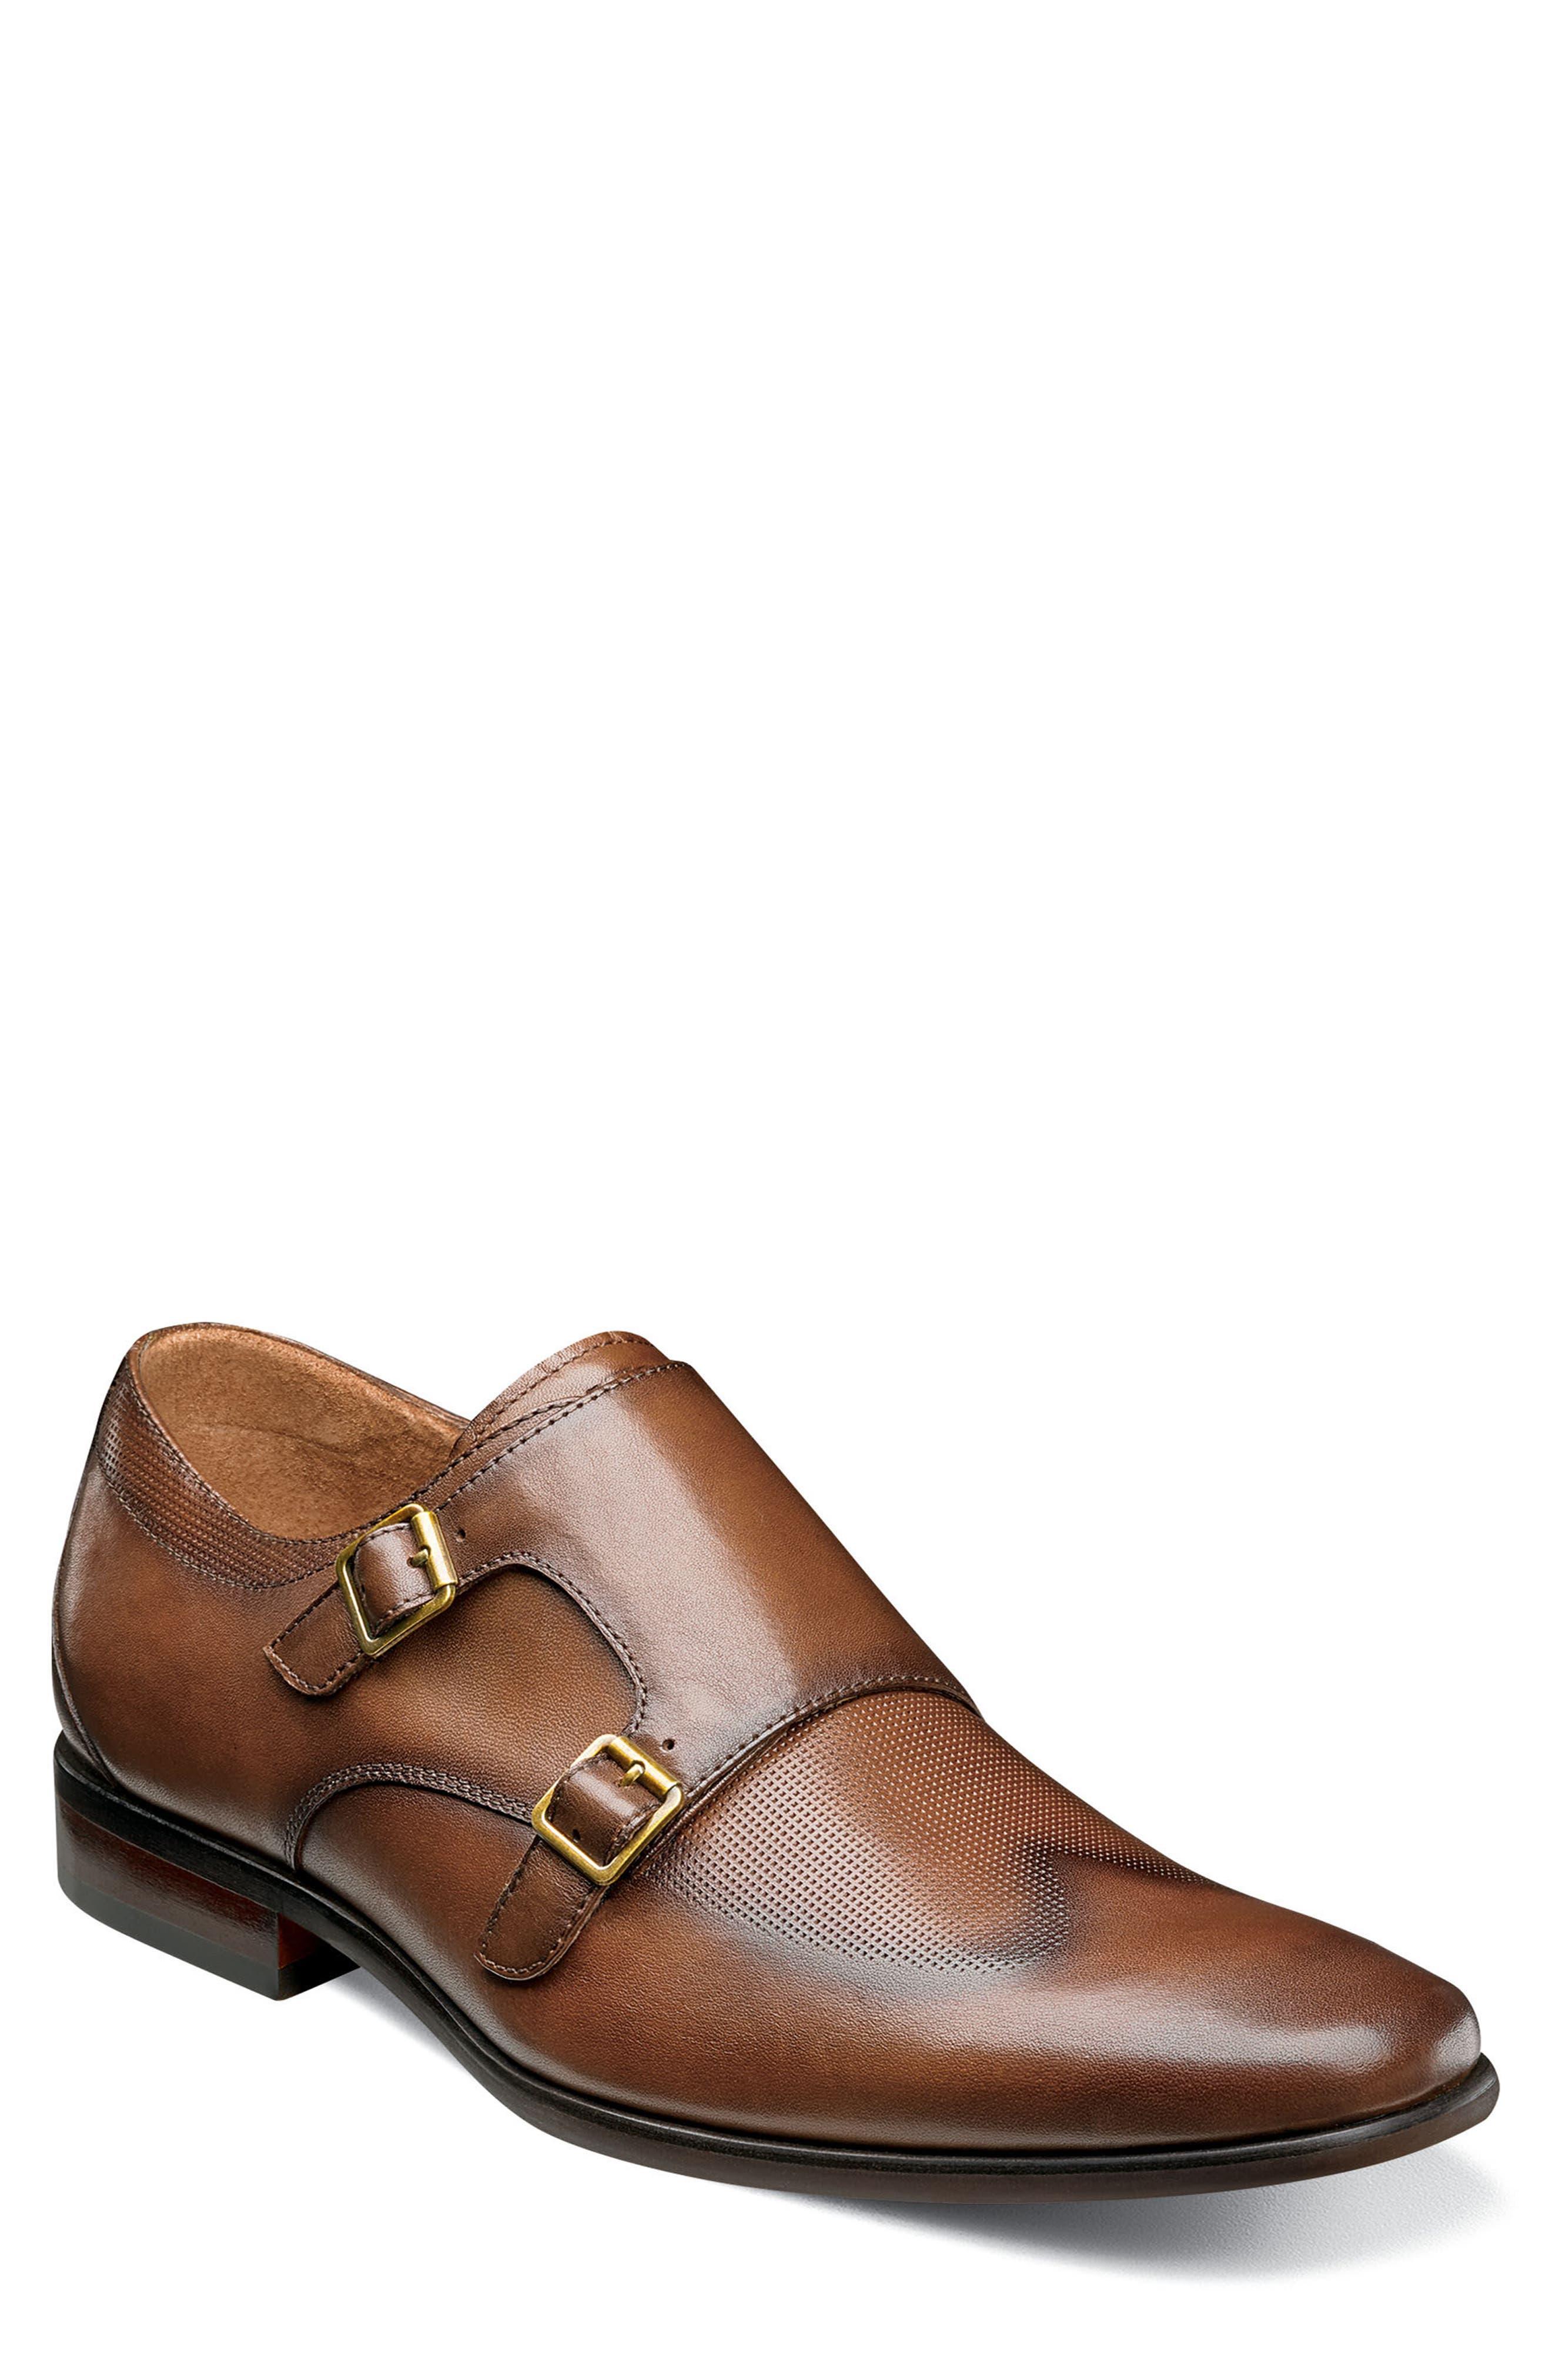 Postino Textured Double Strap Monk Shoe,                             Main thumbnail 1, color,                             Cognac Leather